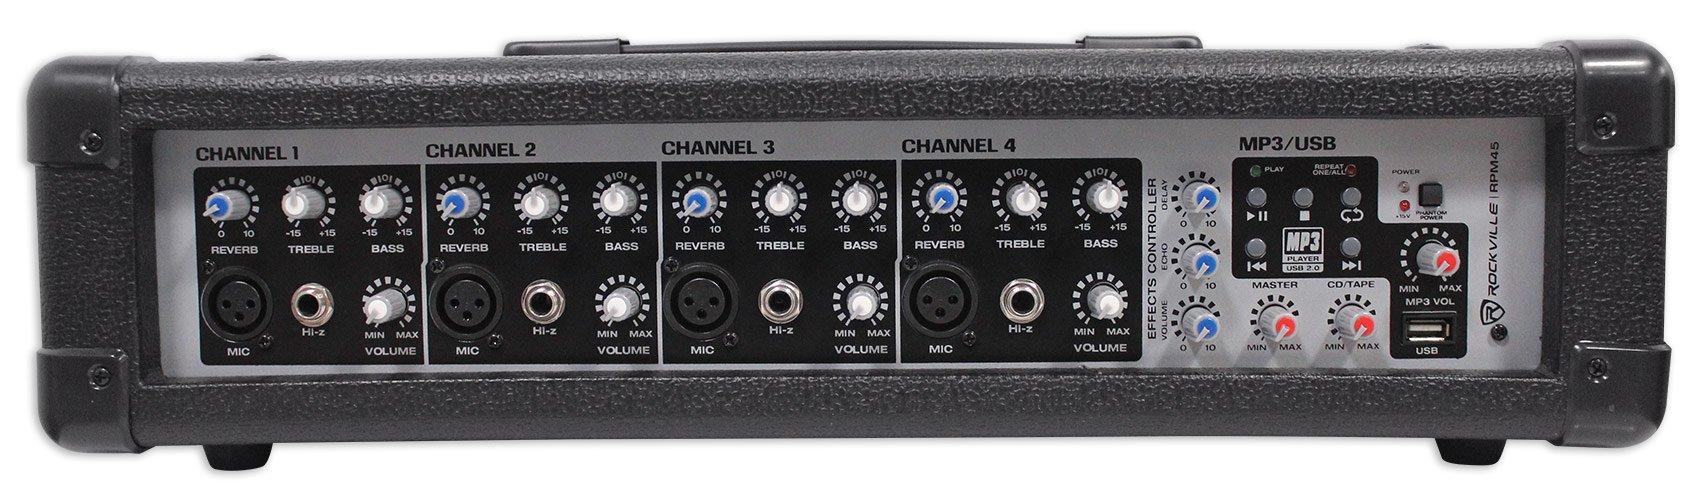 Rockville RPM45 2400w Powered 4 Channel Mixer/Amplifier w USB/EQ/Effects/Phantom